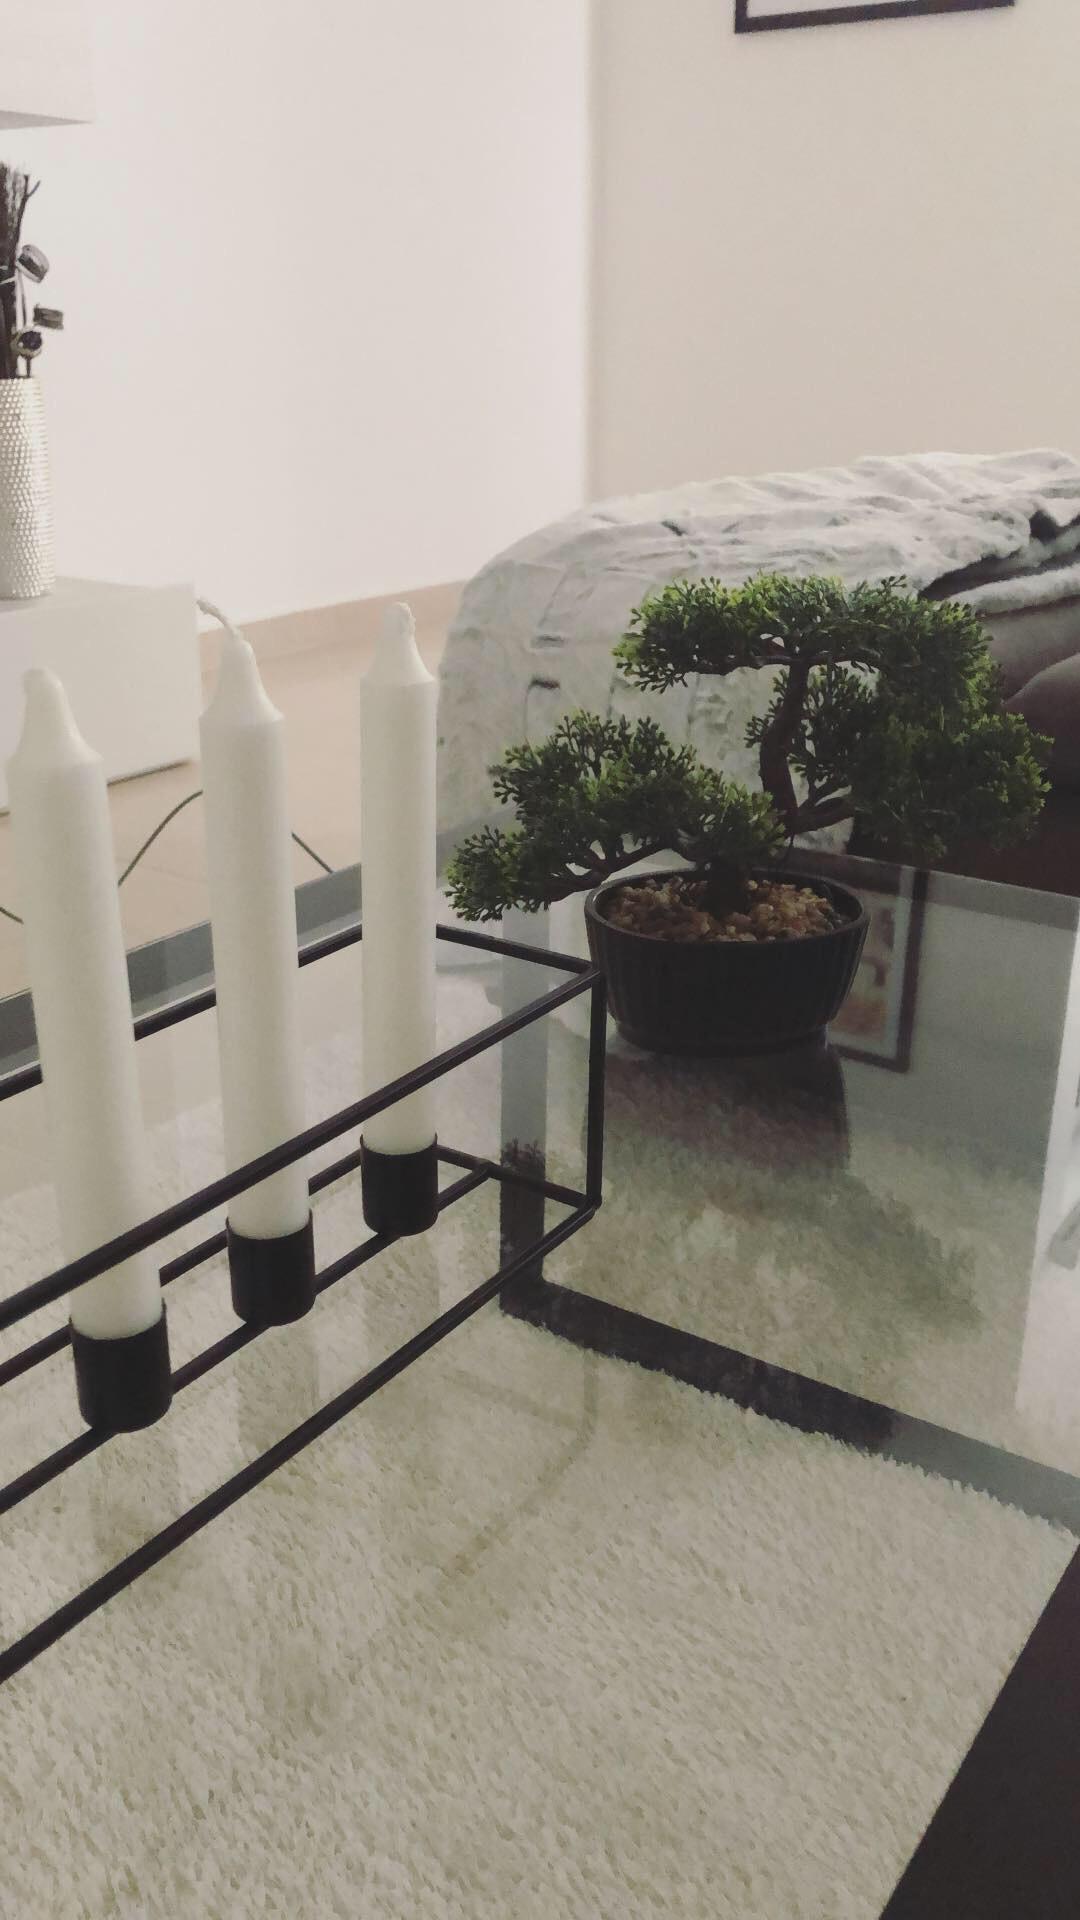 malta-koti-sisustus-olohuone